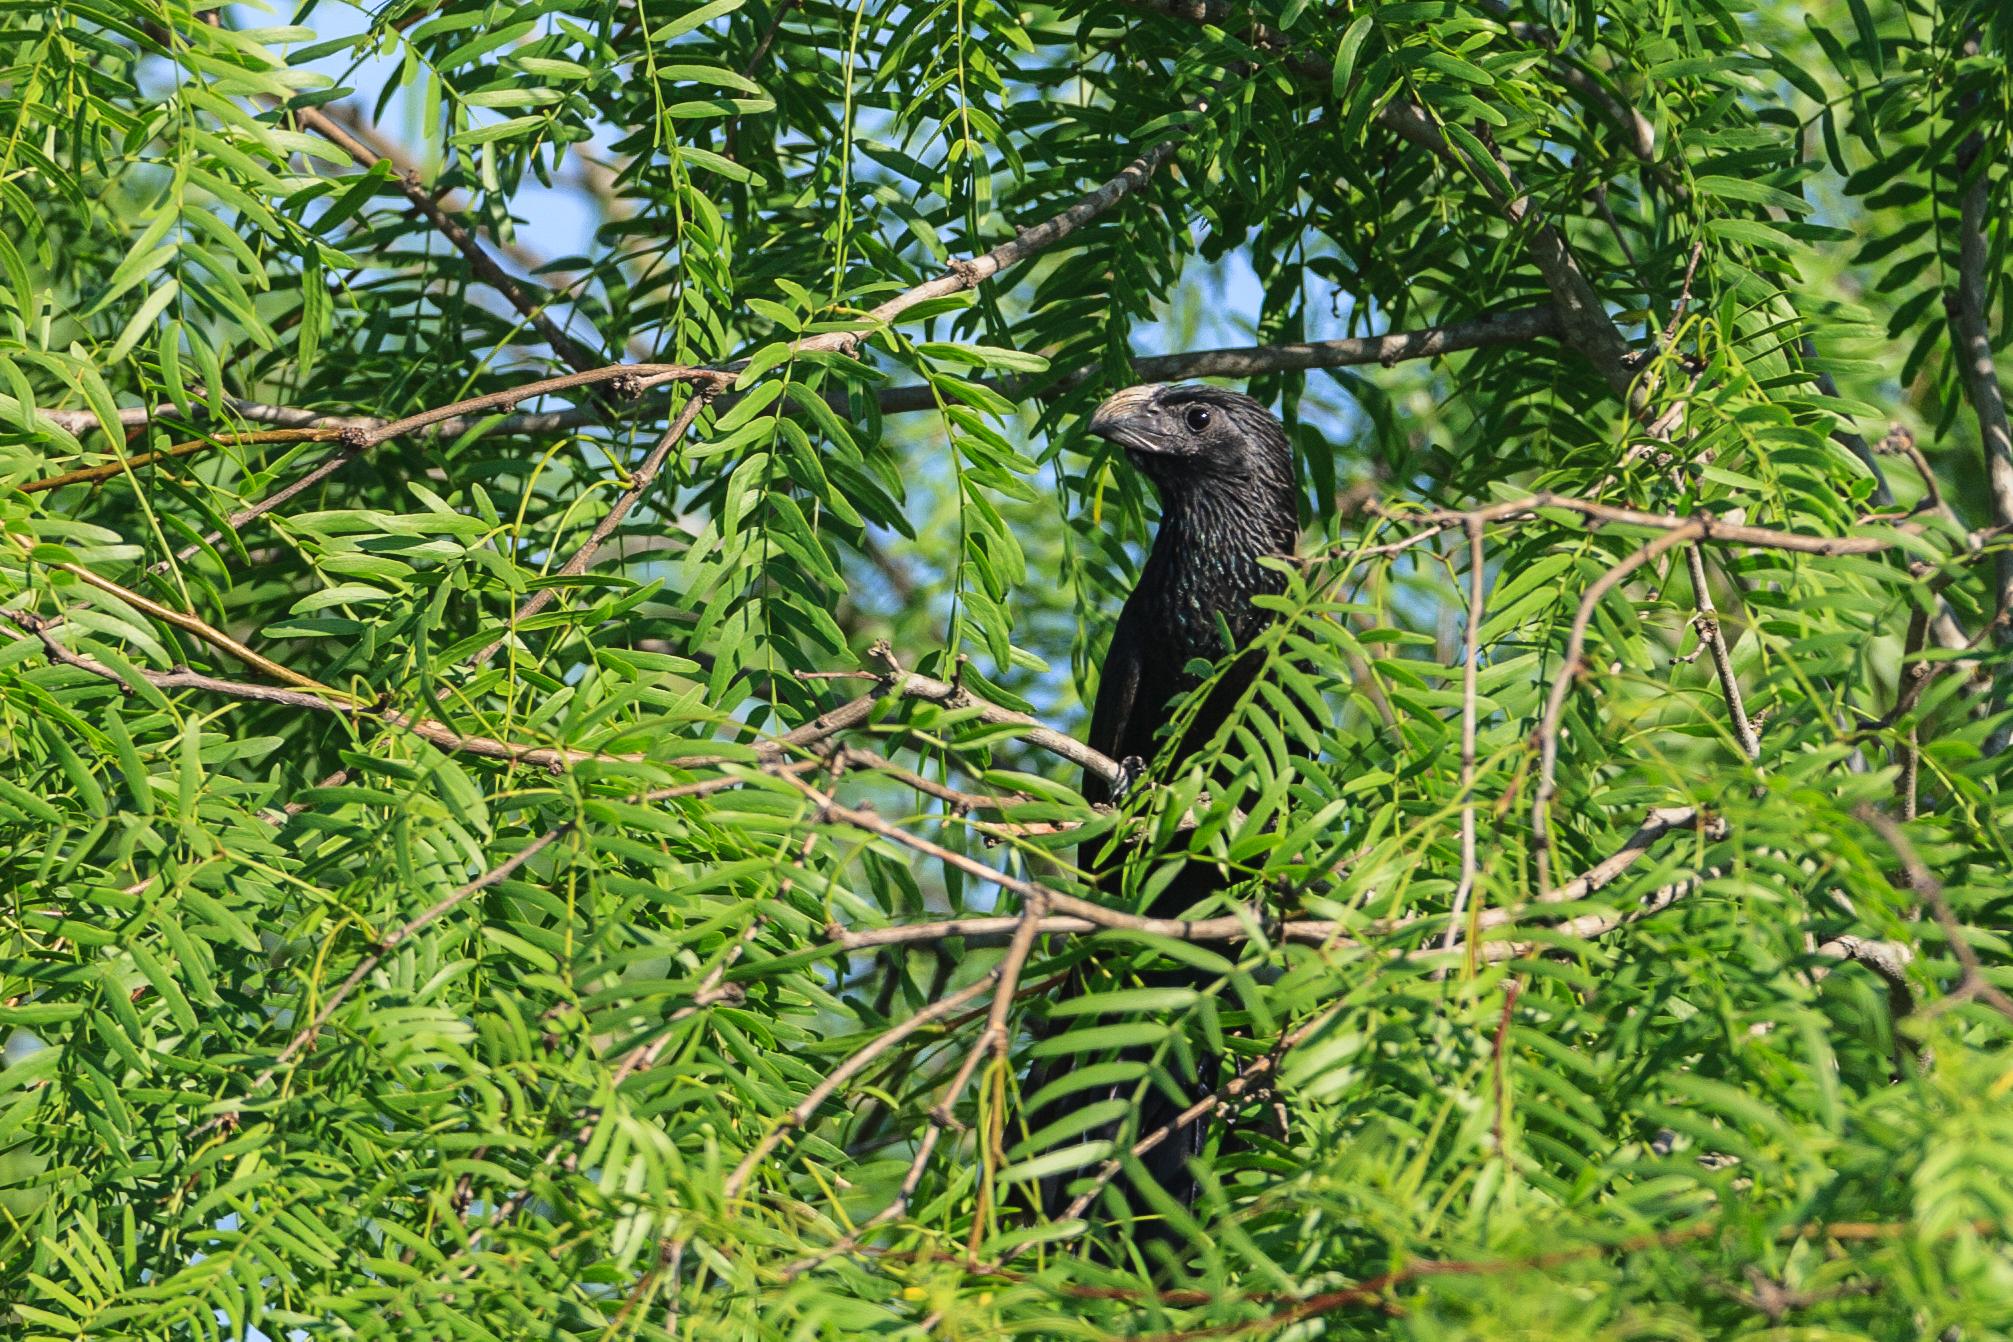 Species: Groove-billed Ani Photo Credit: Damian Martinez Date: May 2018 Location: Mitchell Lake Audubon Center